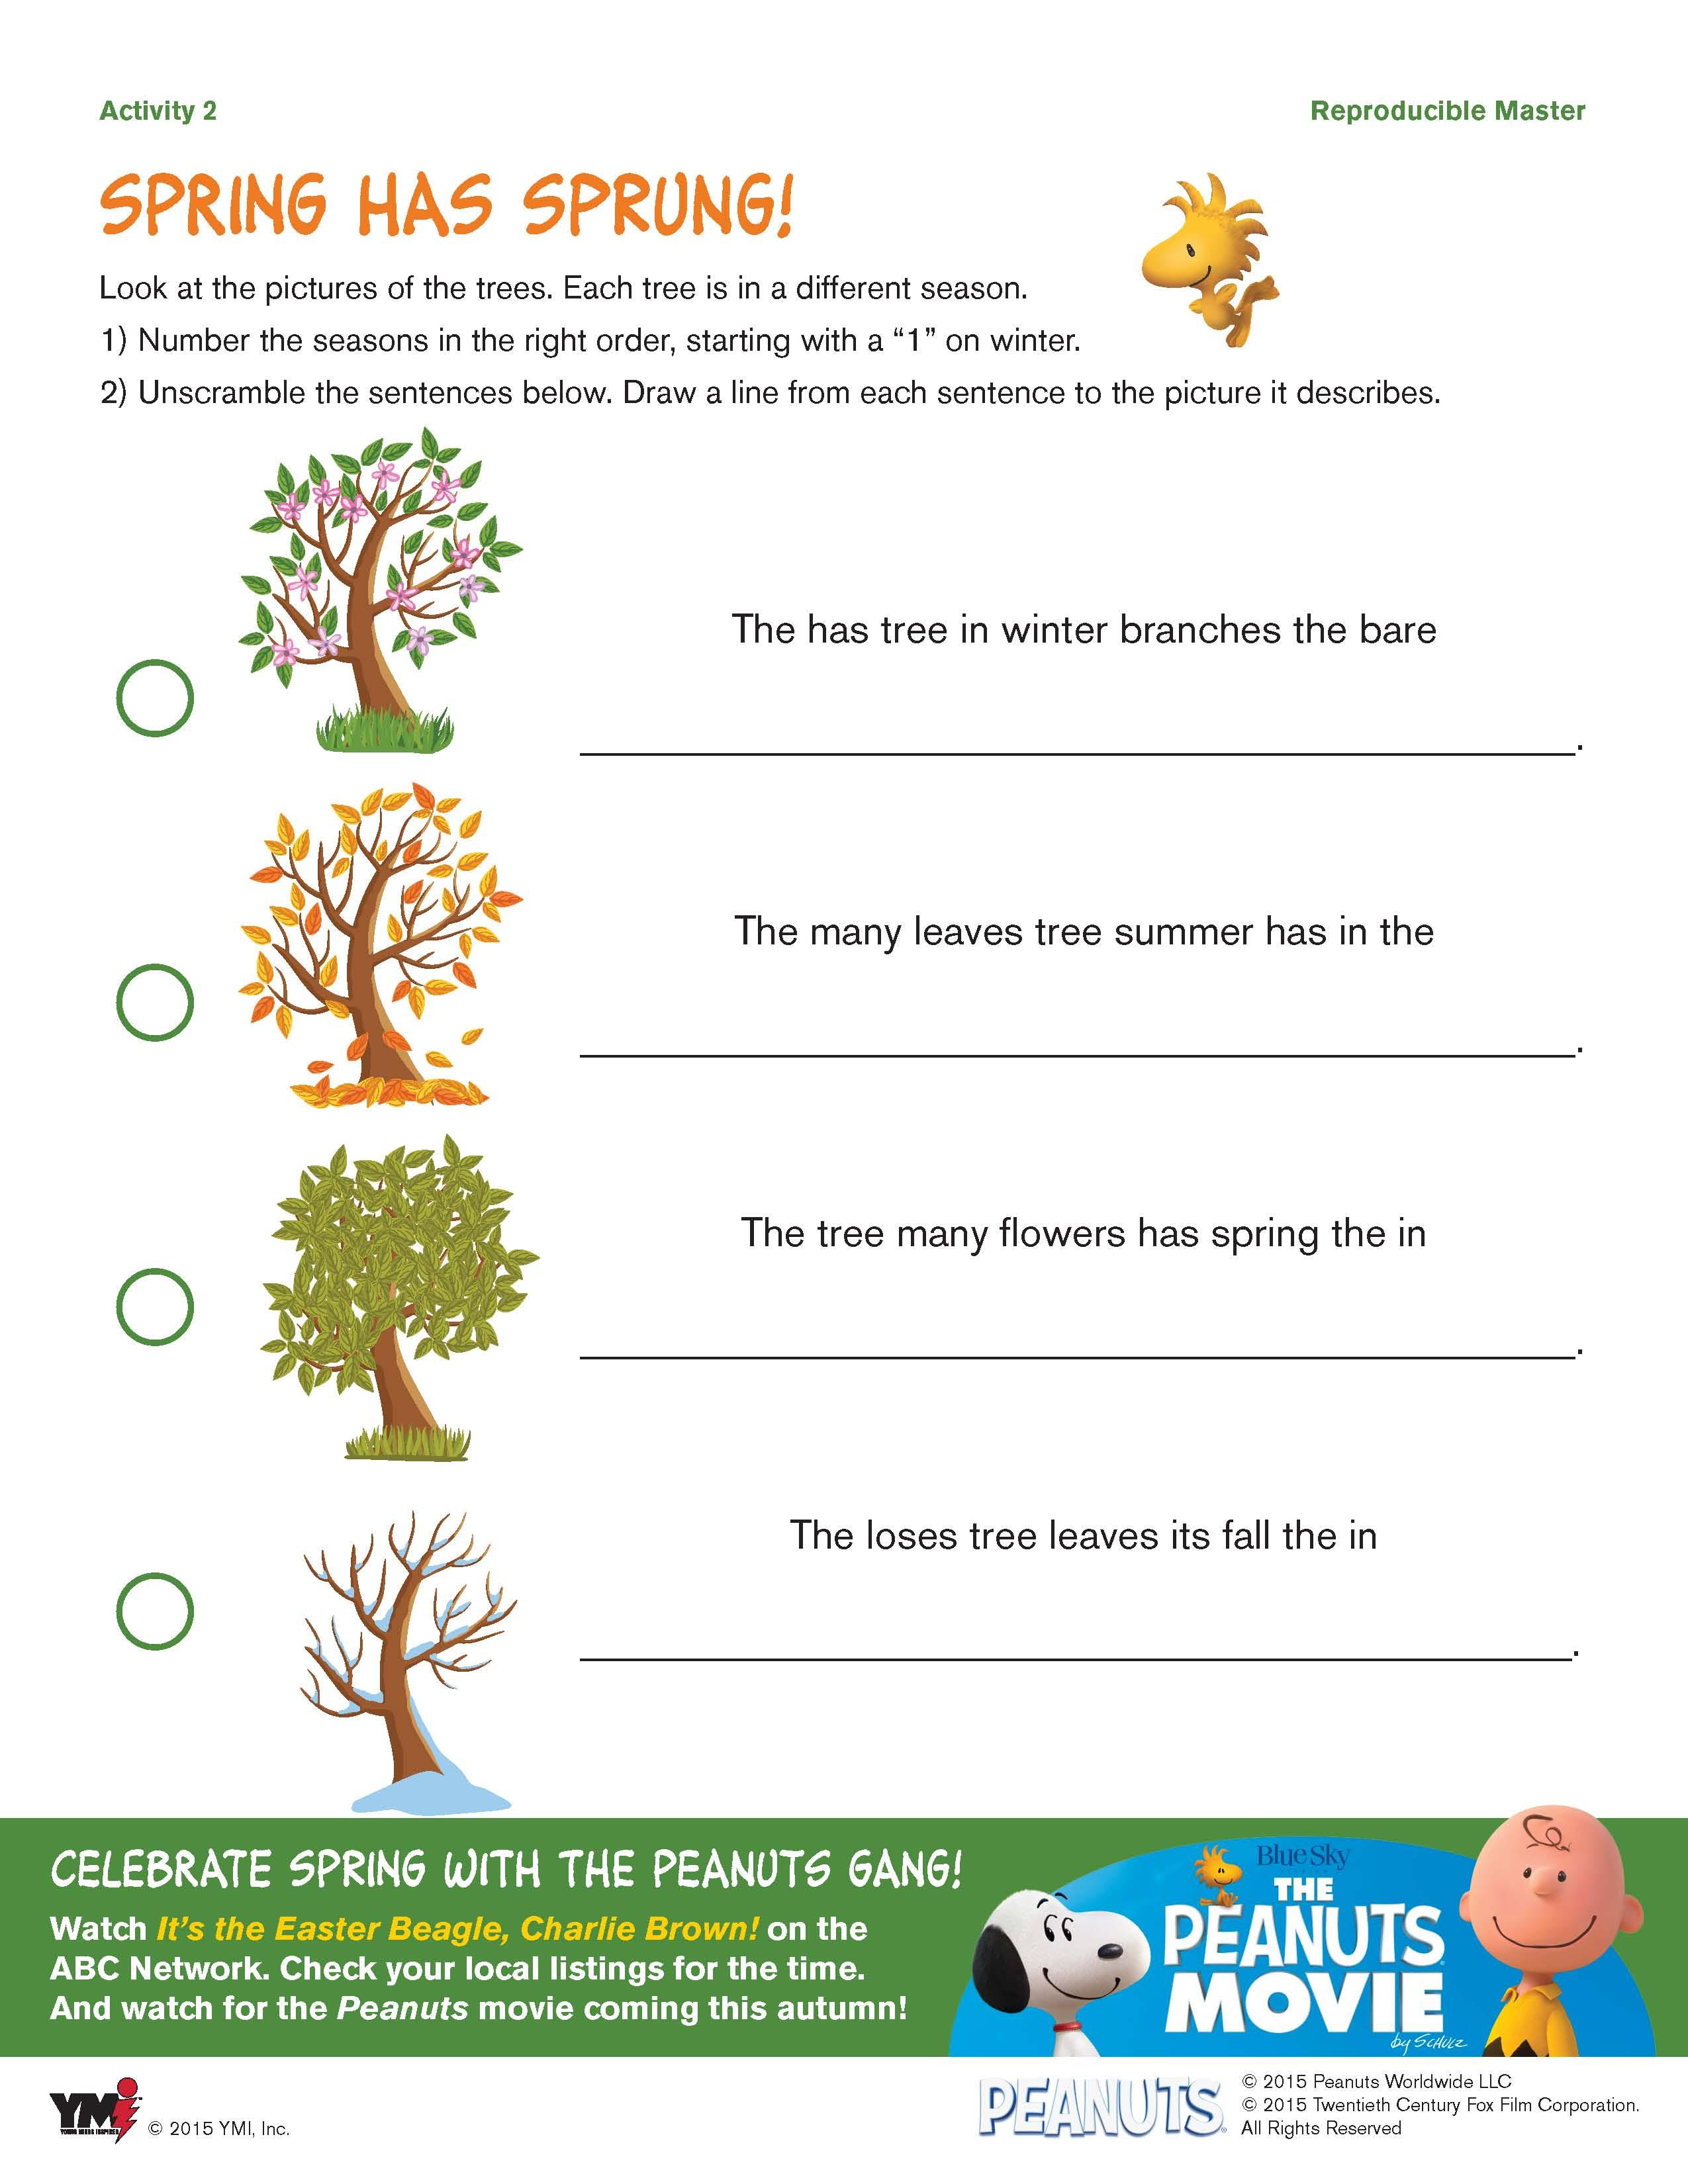 Free Spring Snoopy Springtime Printable Activity Sheets